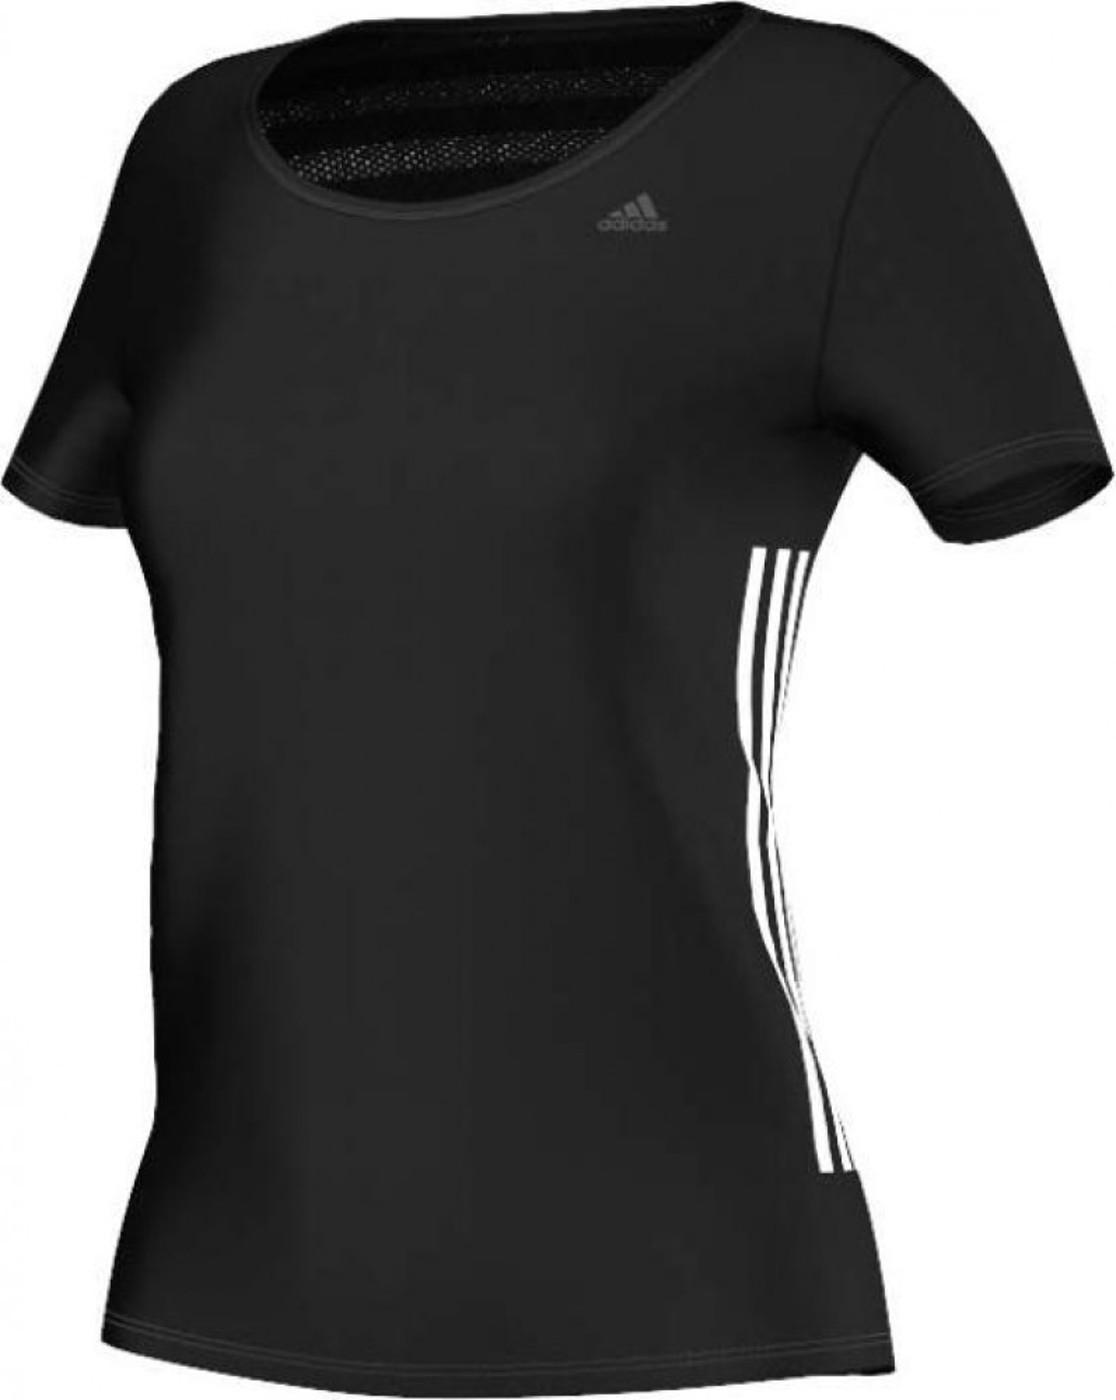 ADIDAS Shirt Gym - Damen